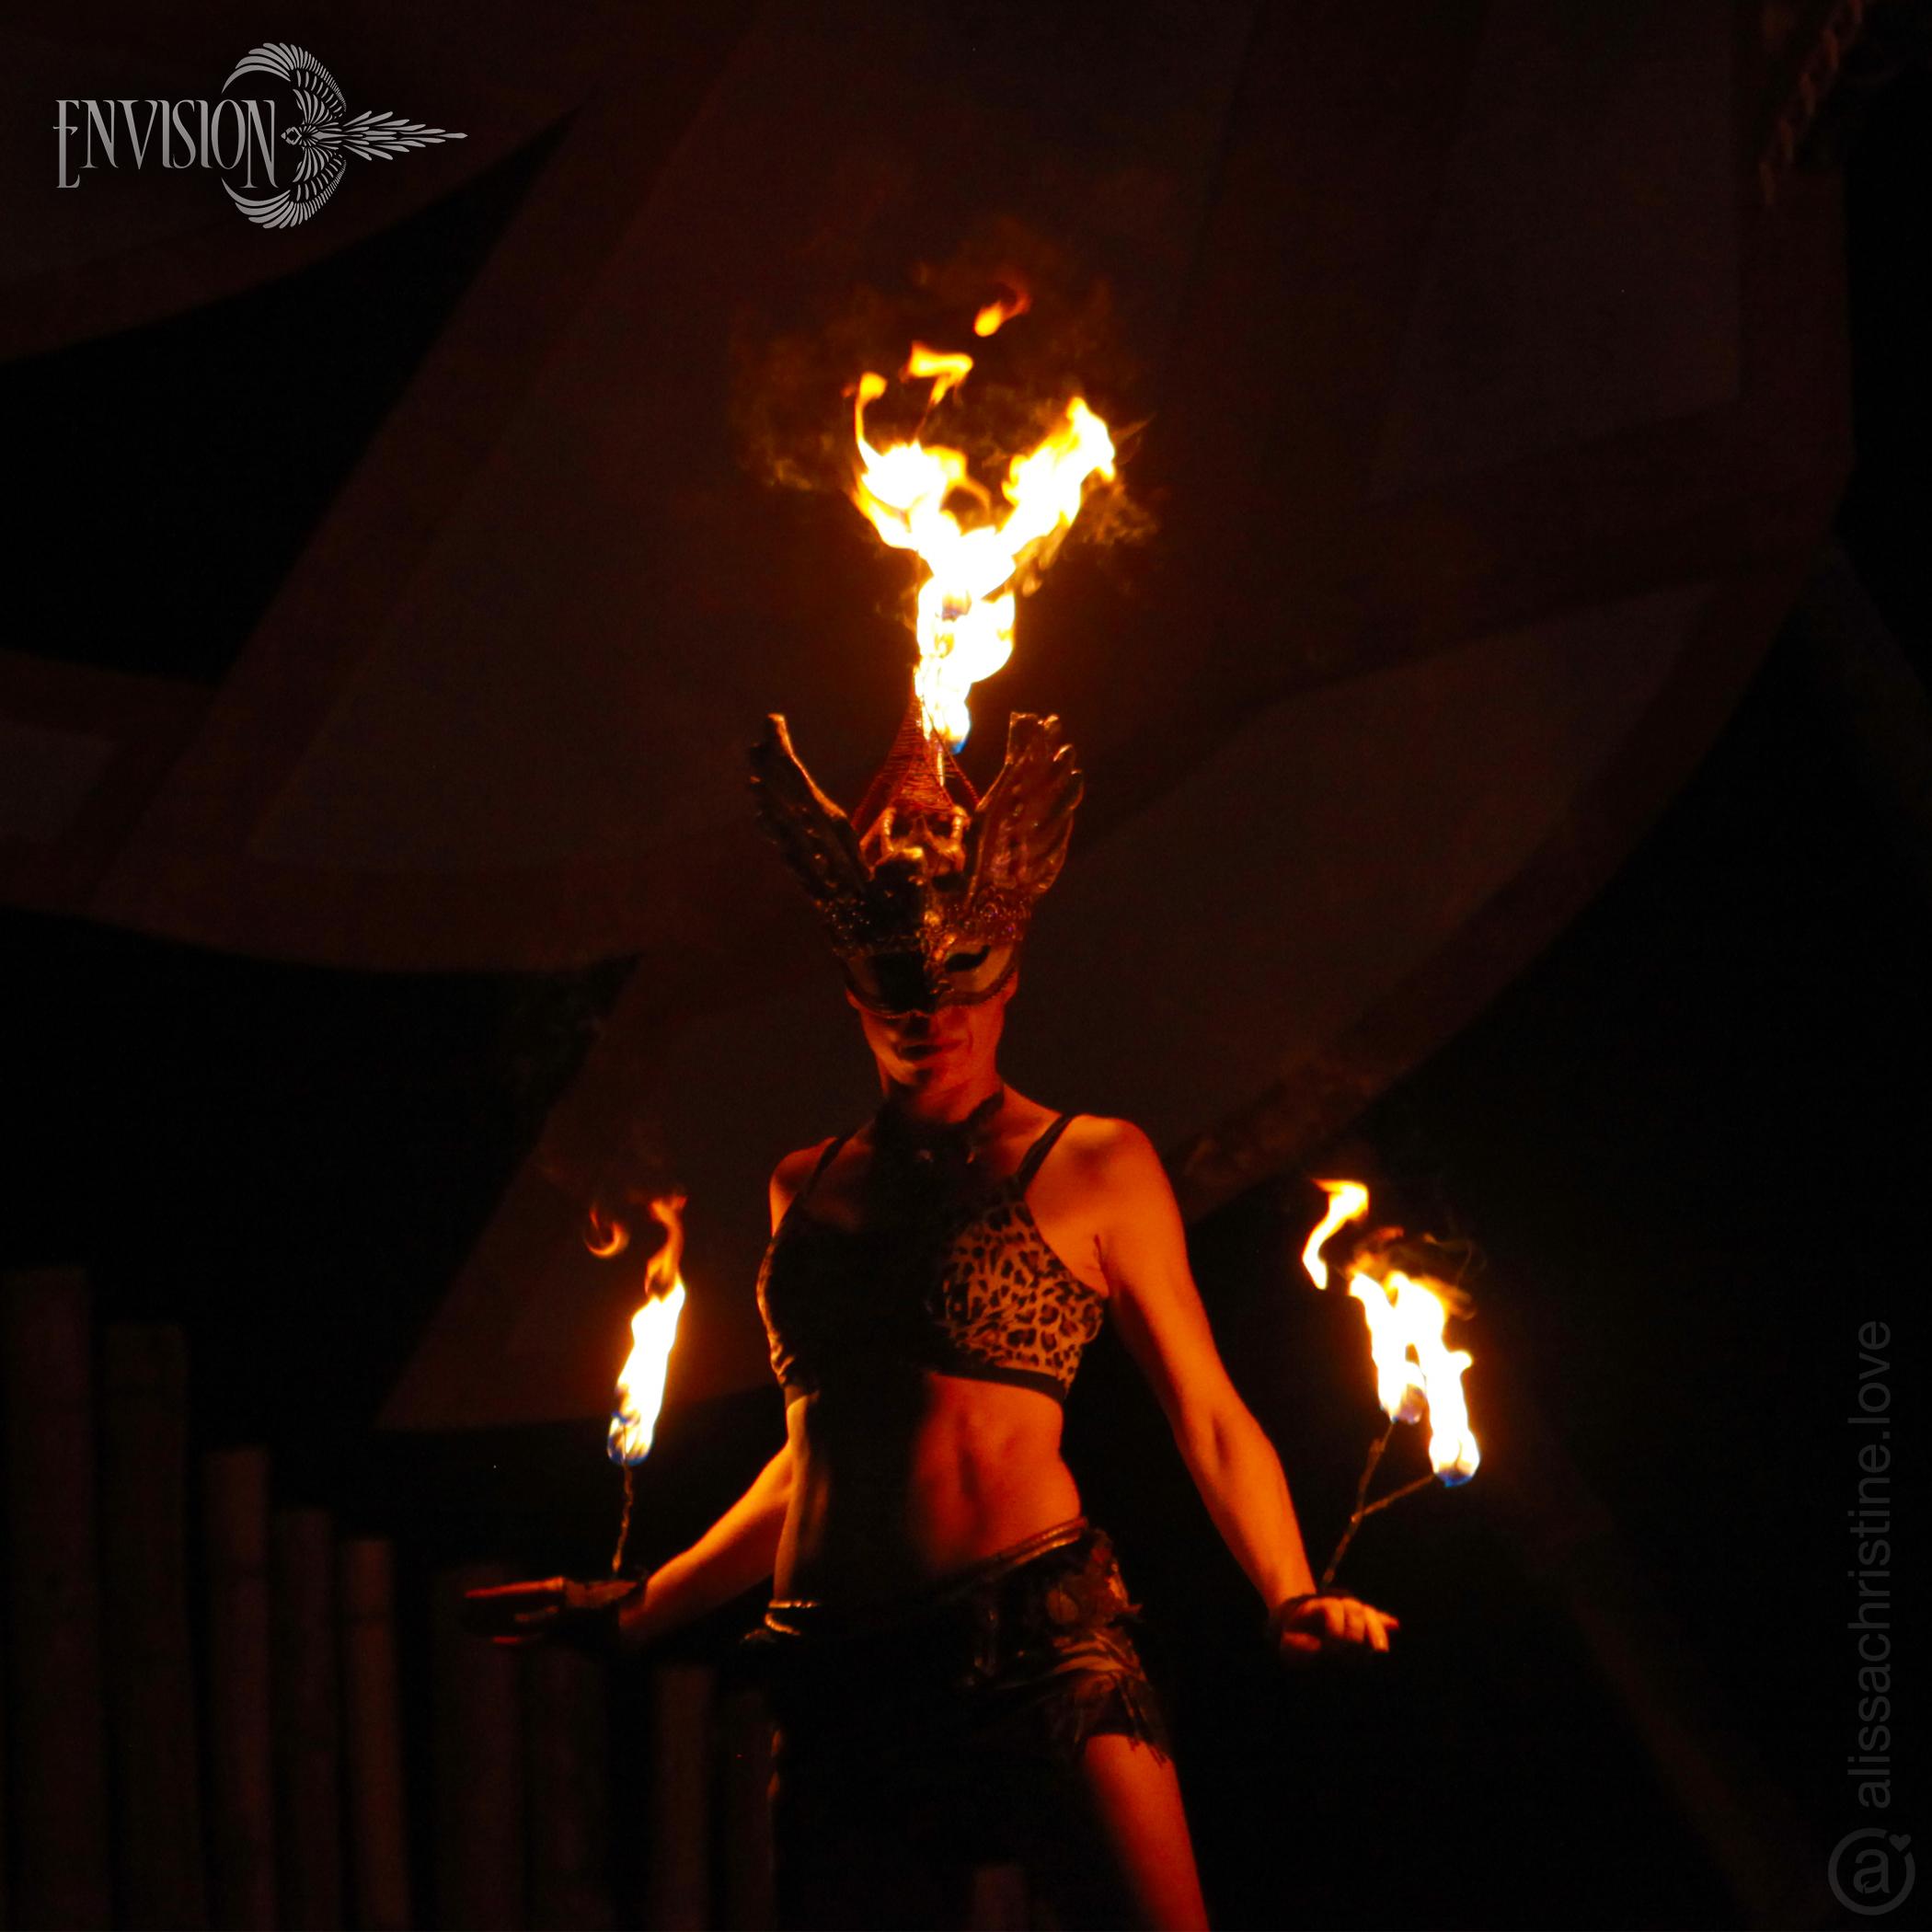 alissaChristine-ef-luna-clozee-dancing-02-25-17-8008-lo.jpg